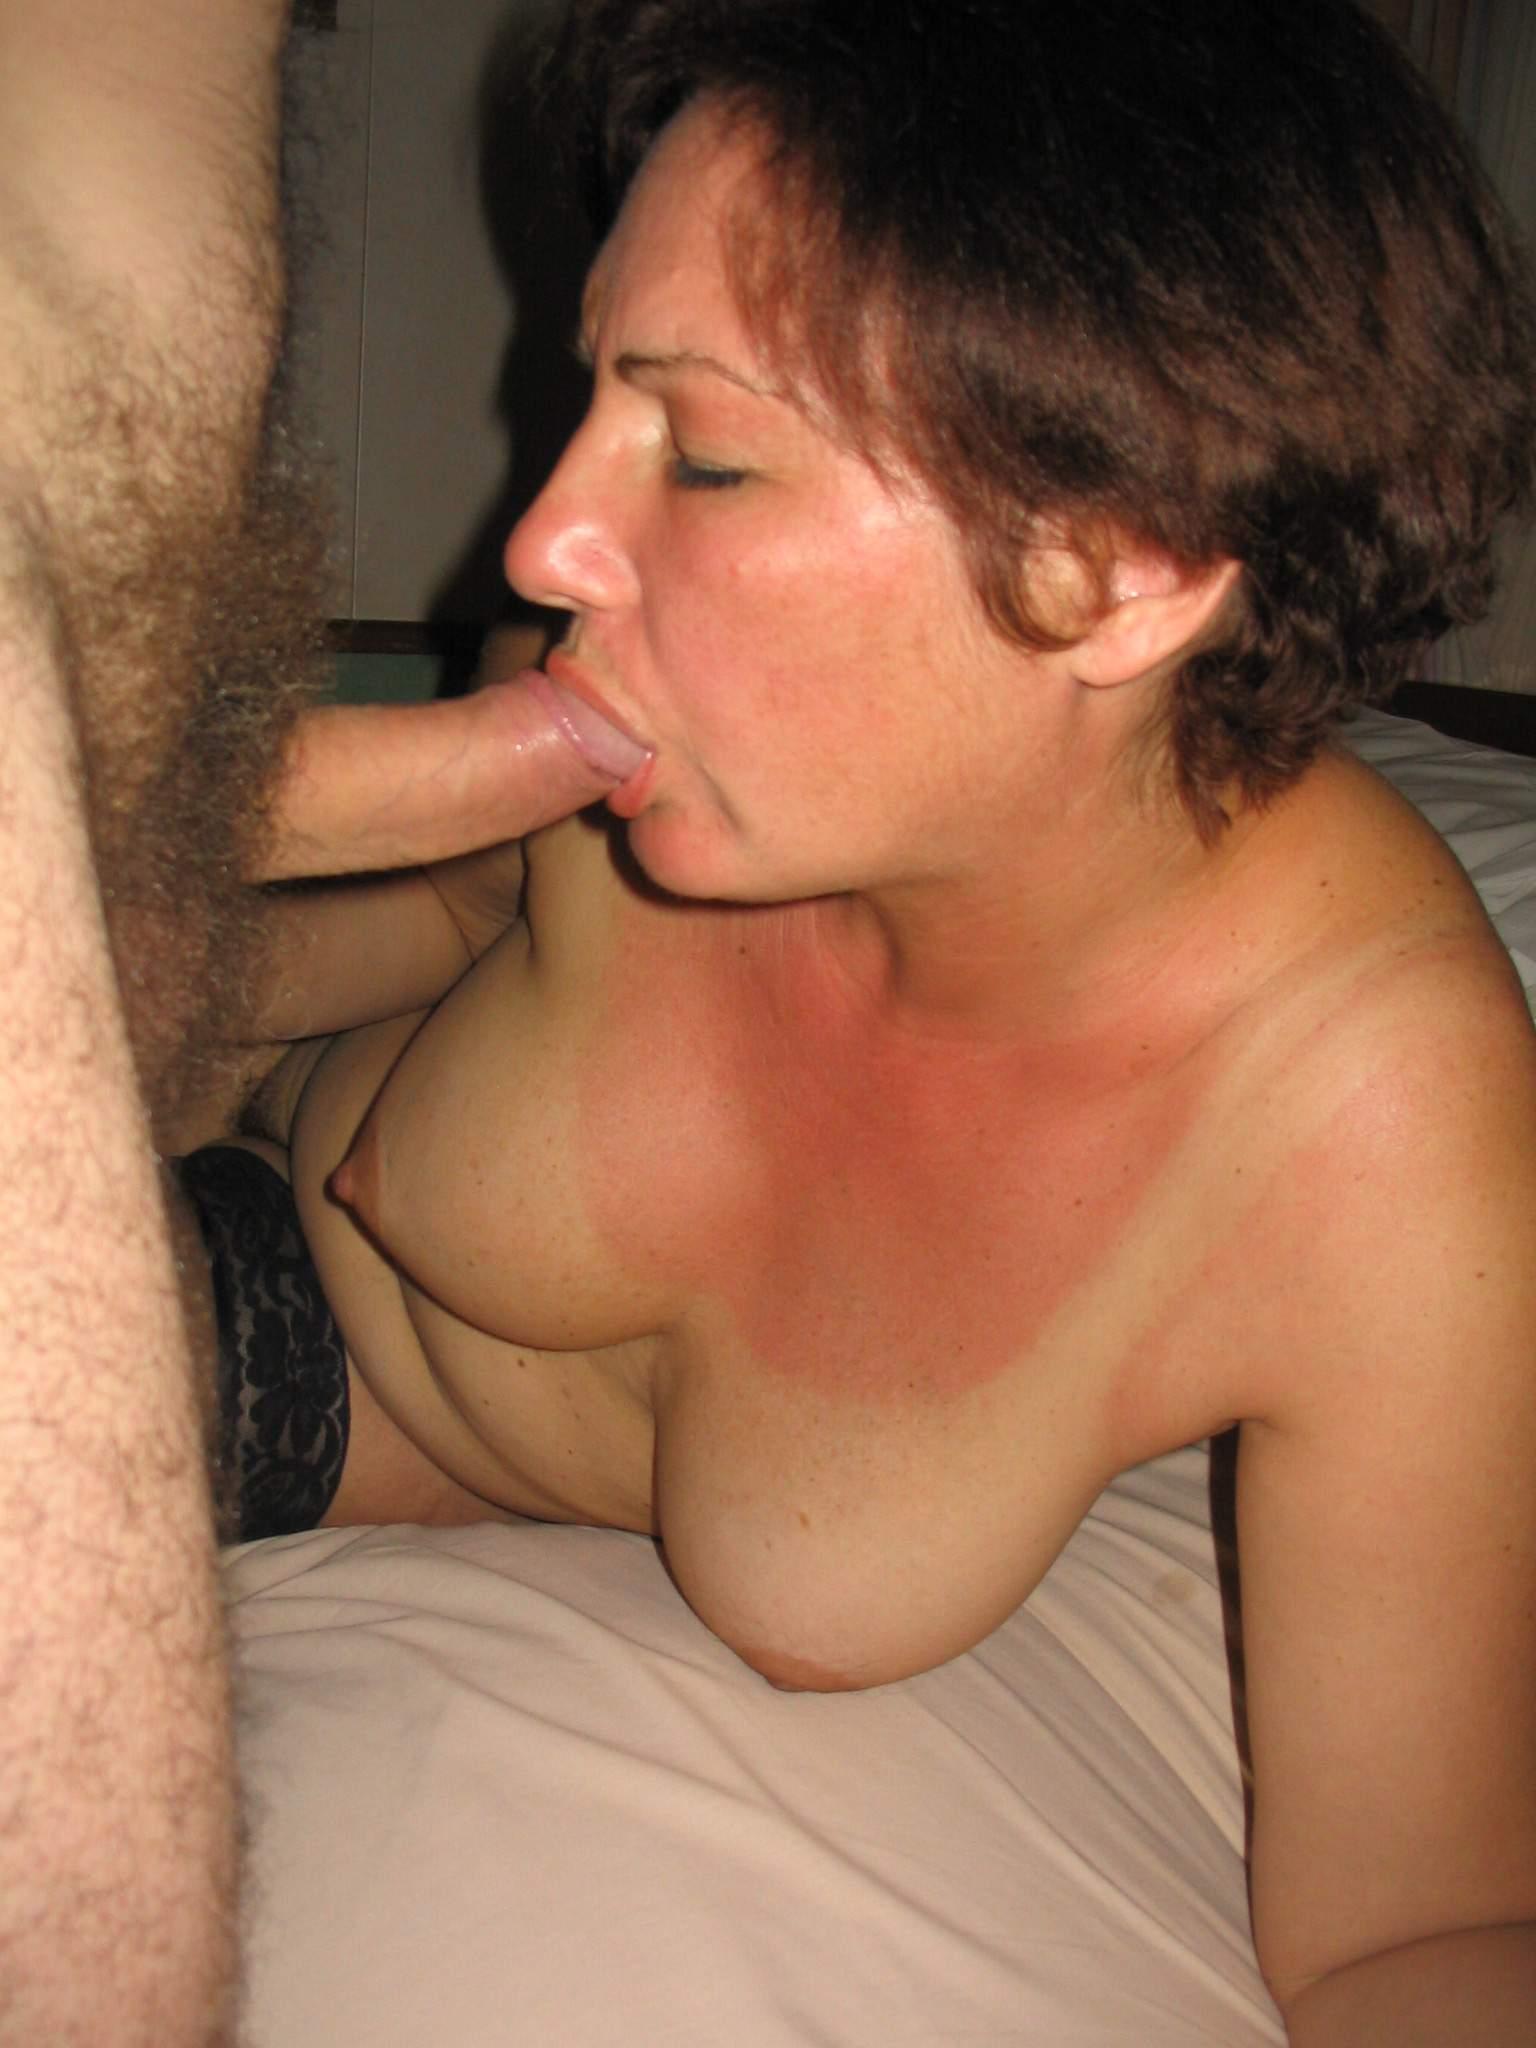 Aunty back nude